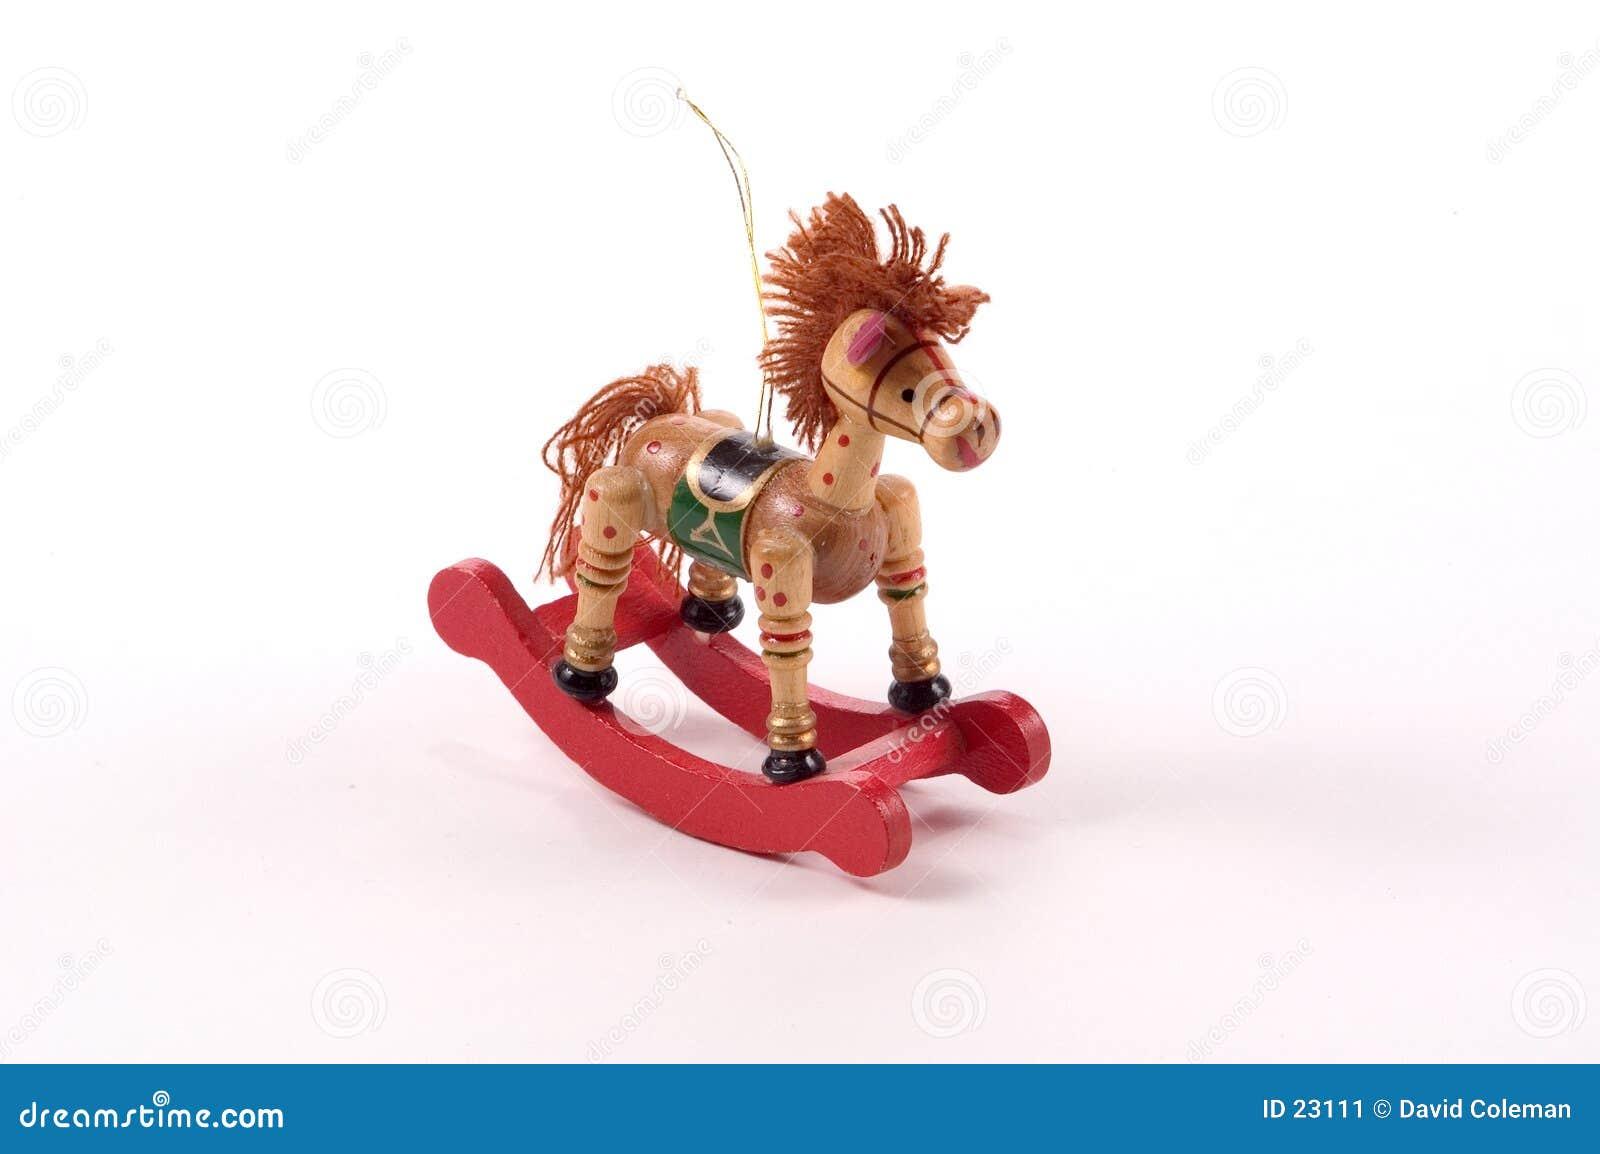 rocking horse tree ornament - Horse Christmas Ornaments